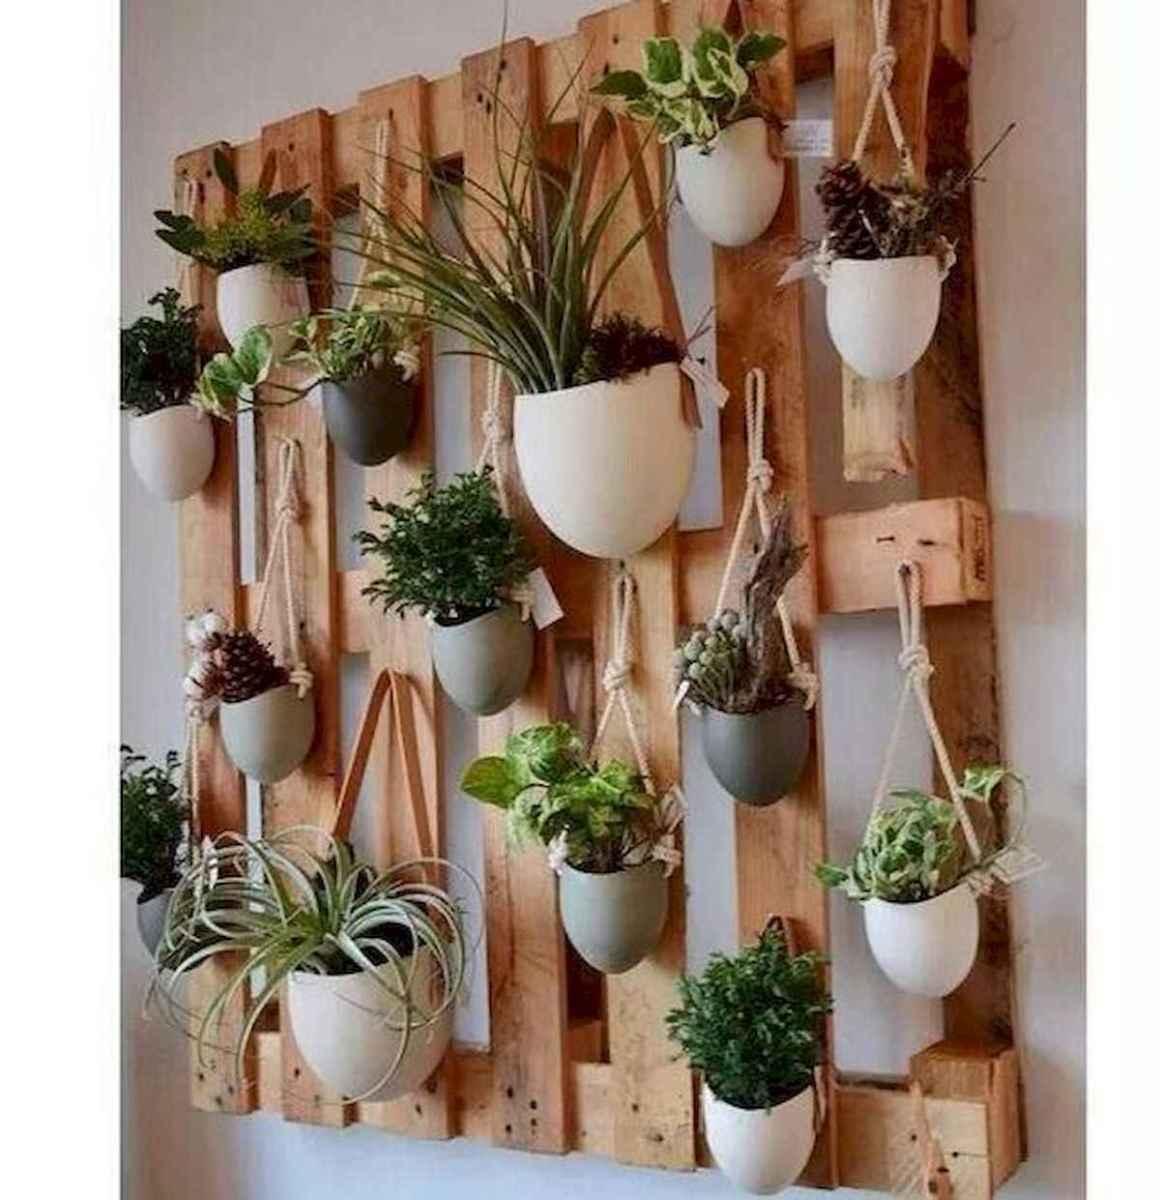 50 Best Indoor Garden For Apartment Design Ideas And Remodel (2)